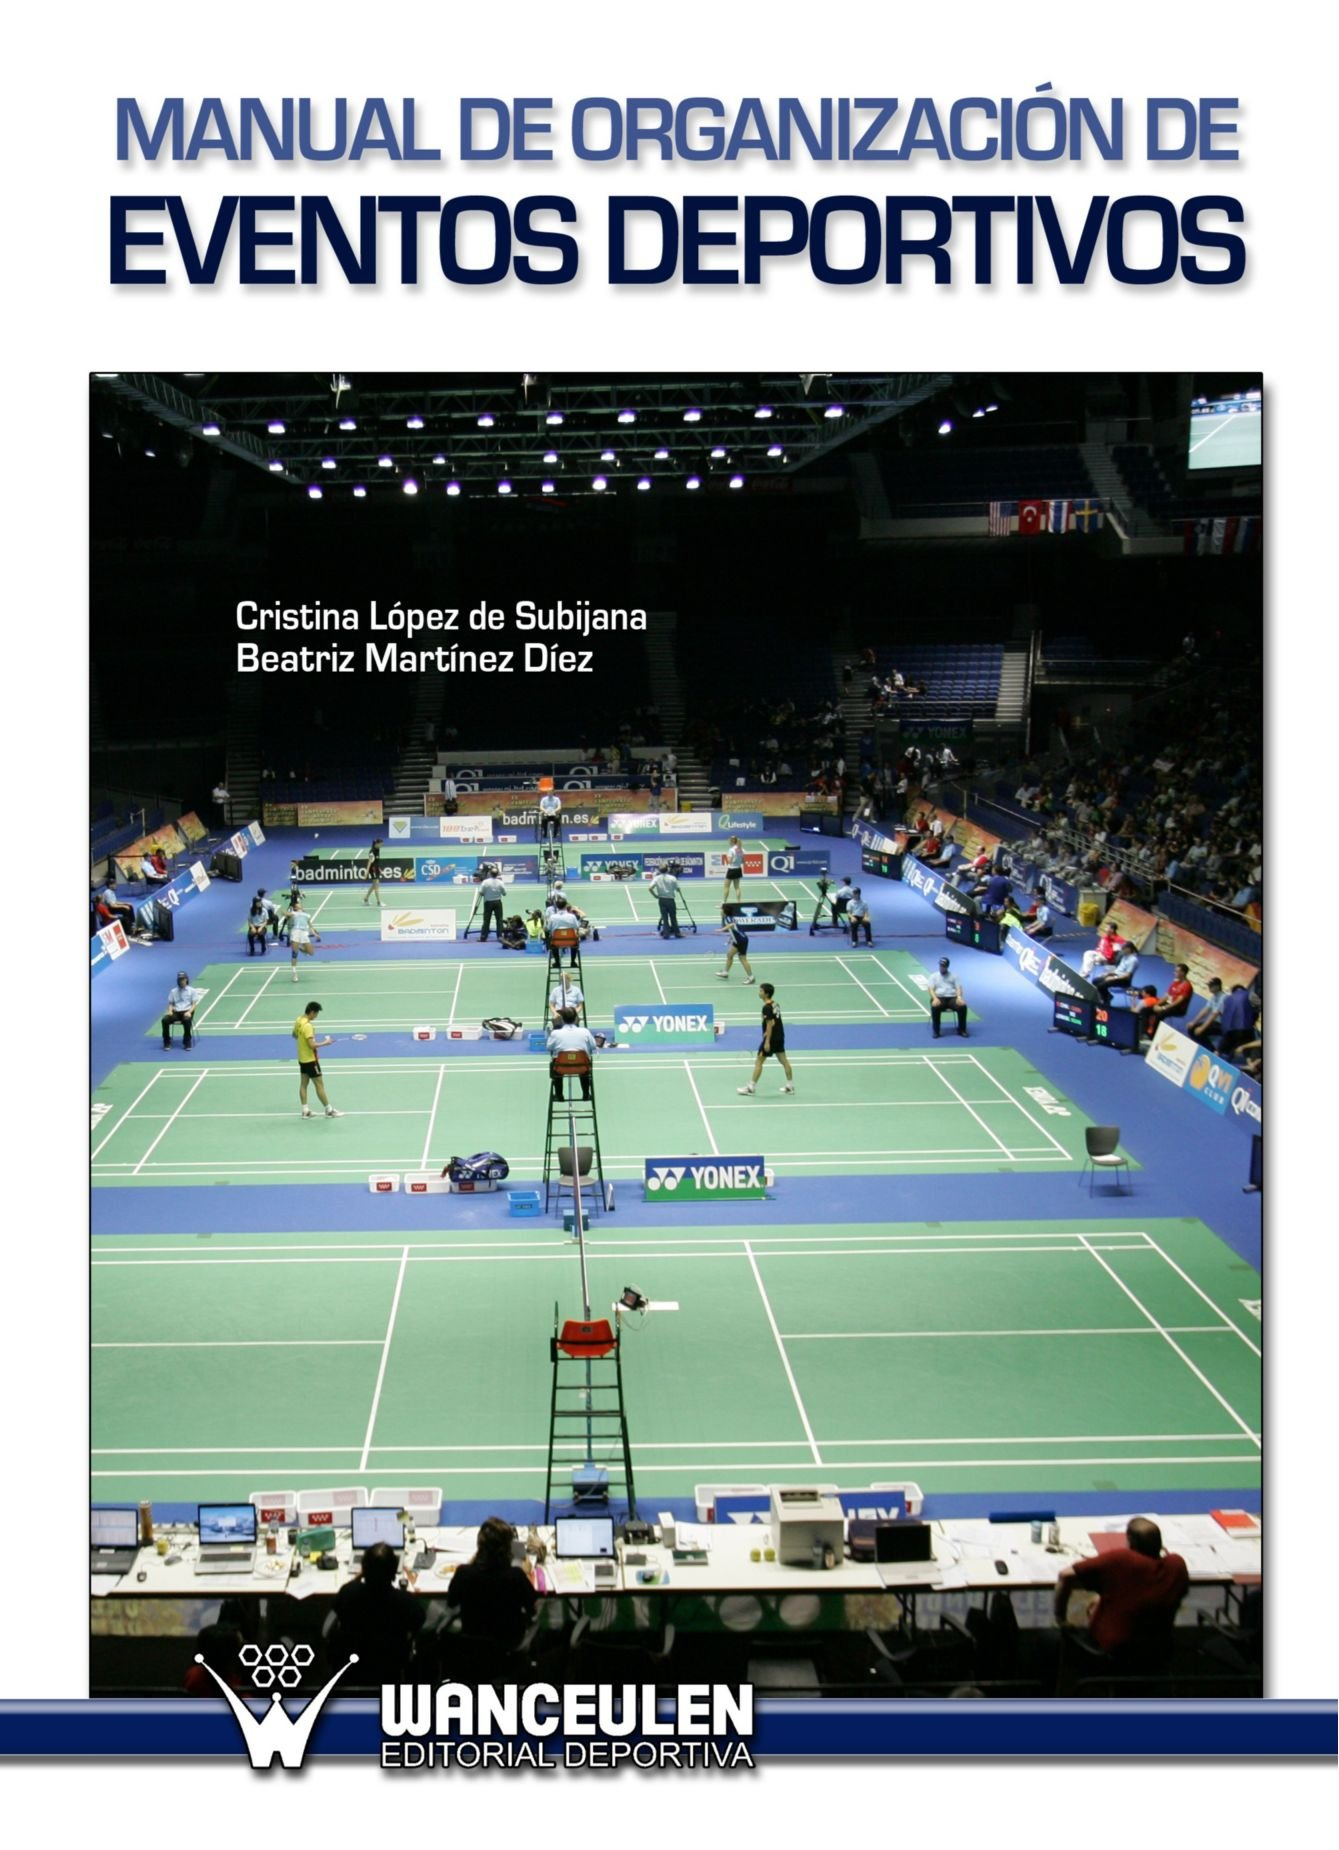 Manual De Organización De Eventos Deportivos (Spanish Edition) (Spanish) Paperback – February 11, 2011